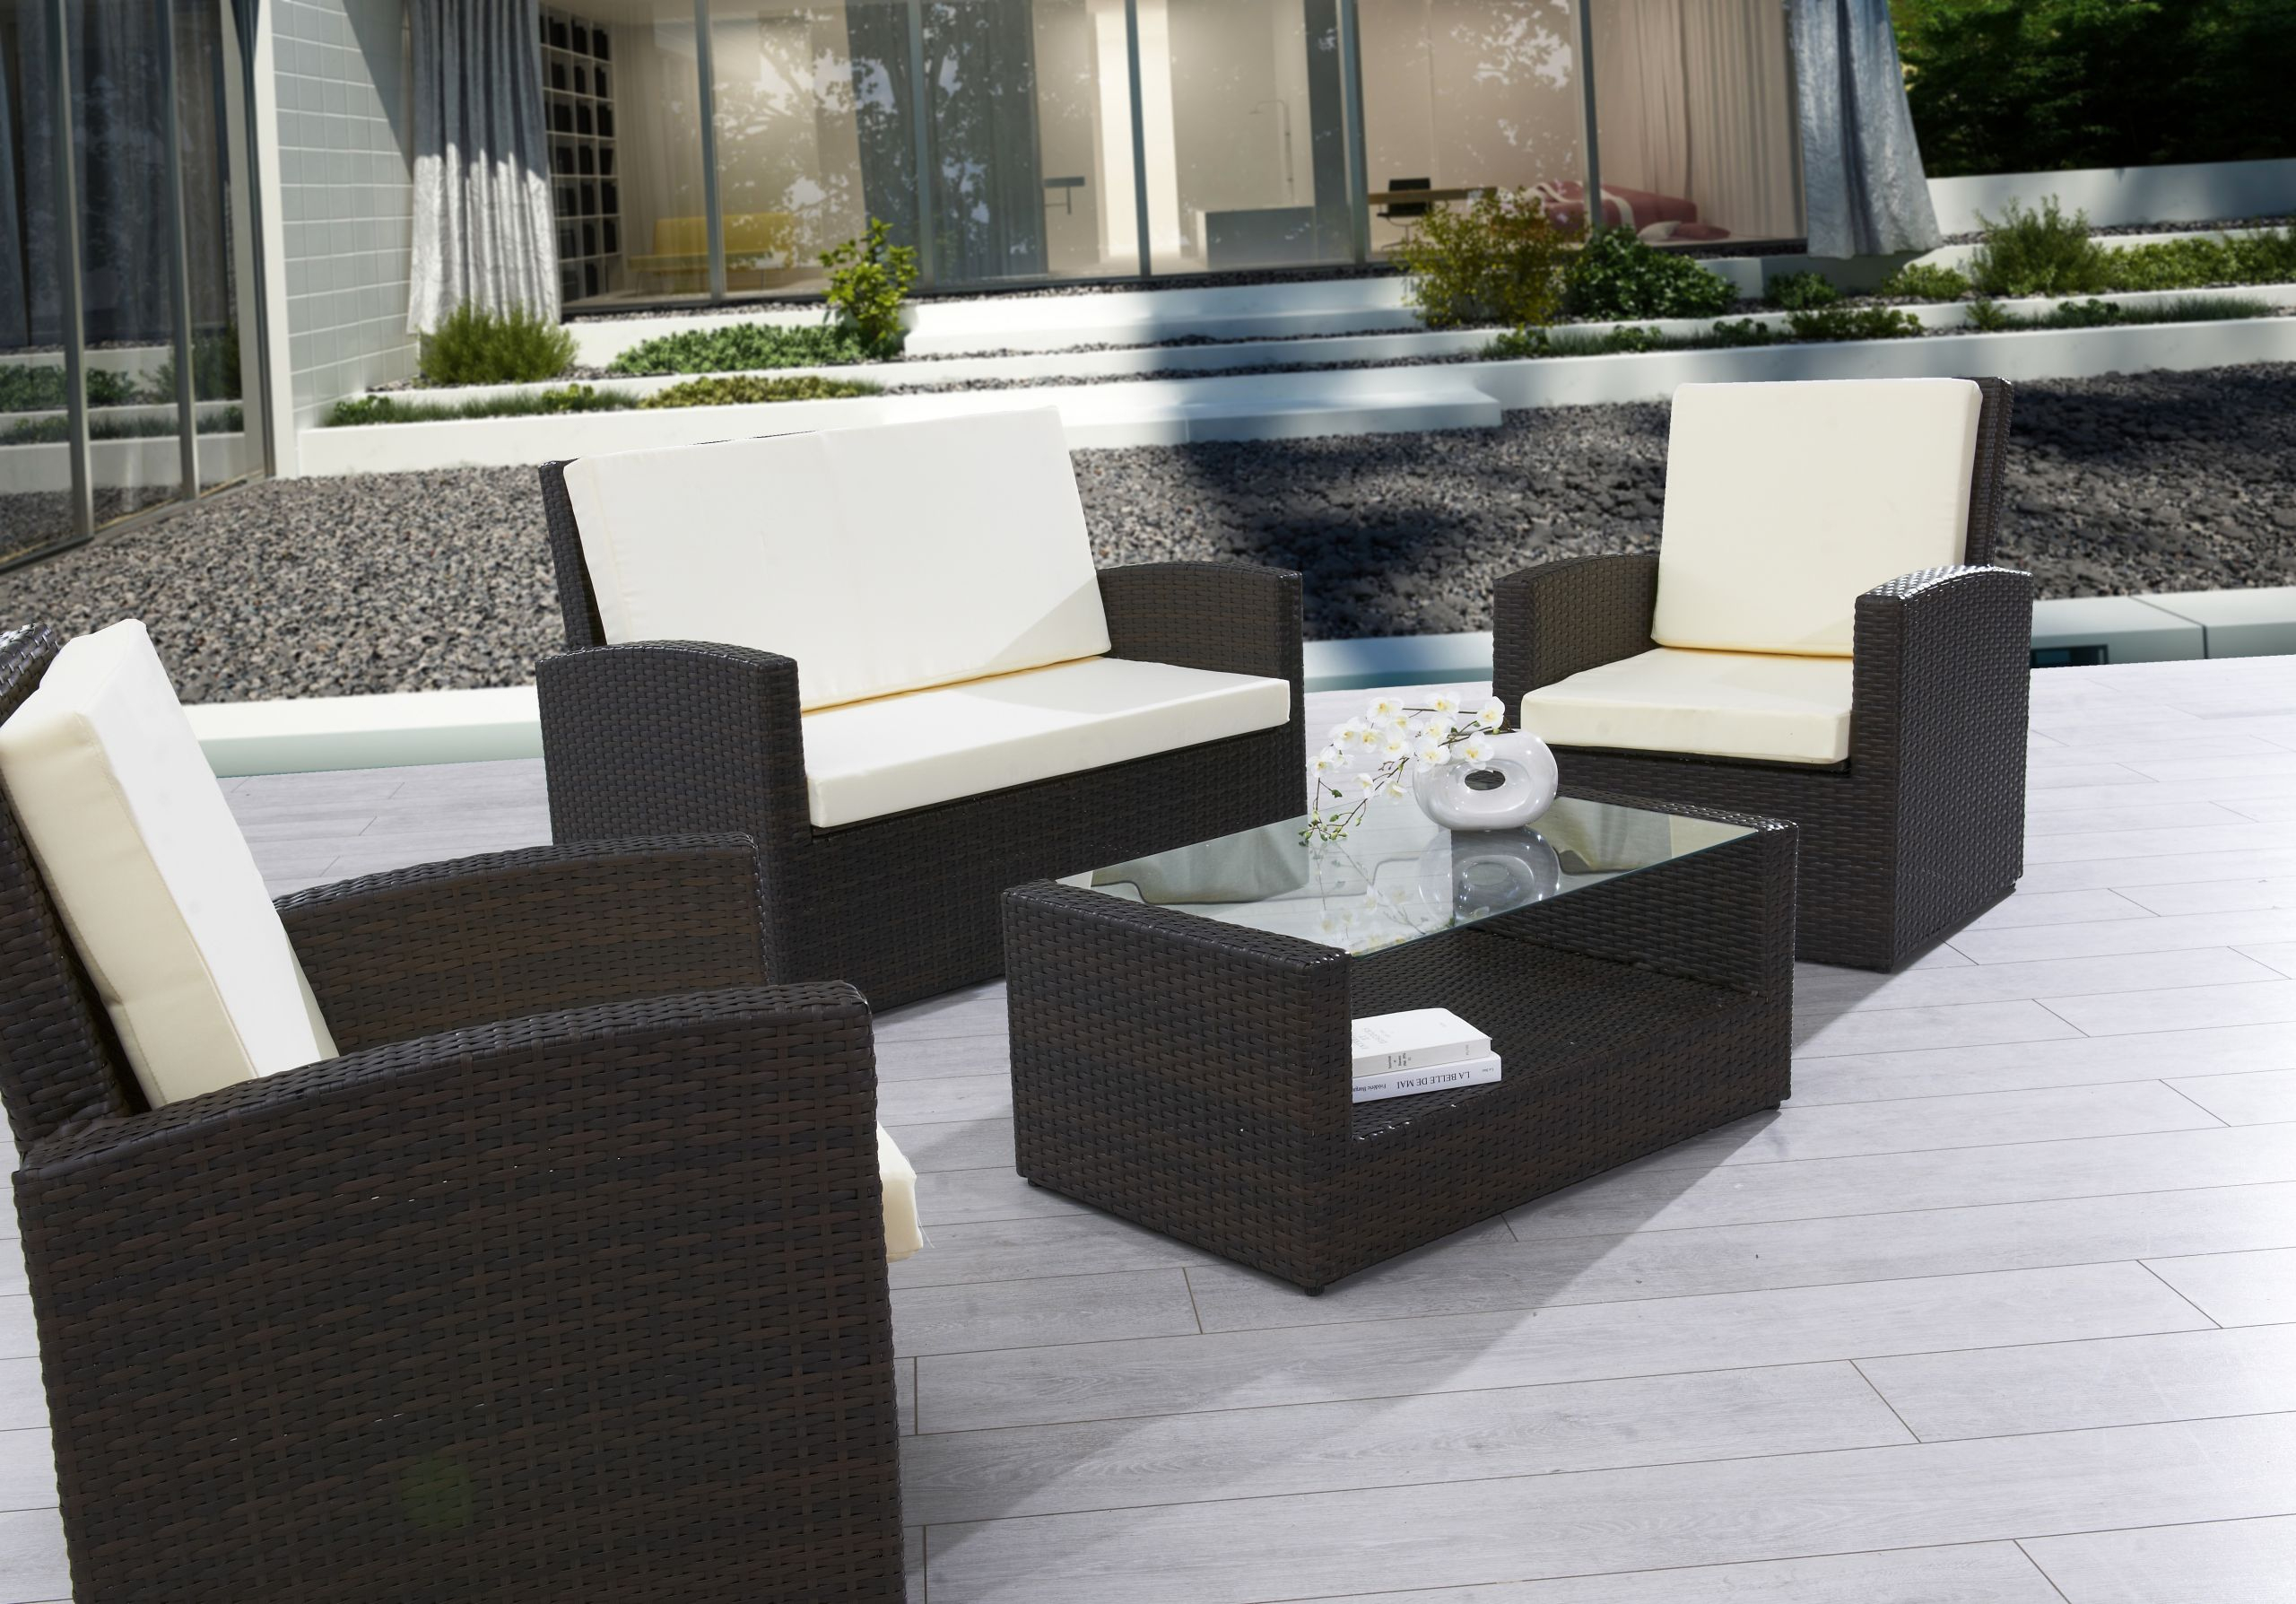 24 Best Of Salon De Jardin Design En Solde | Salon Jardin dedans Salon De Jardin En Soldes